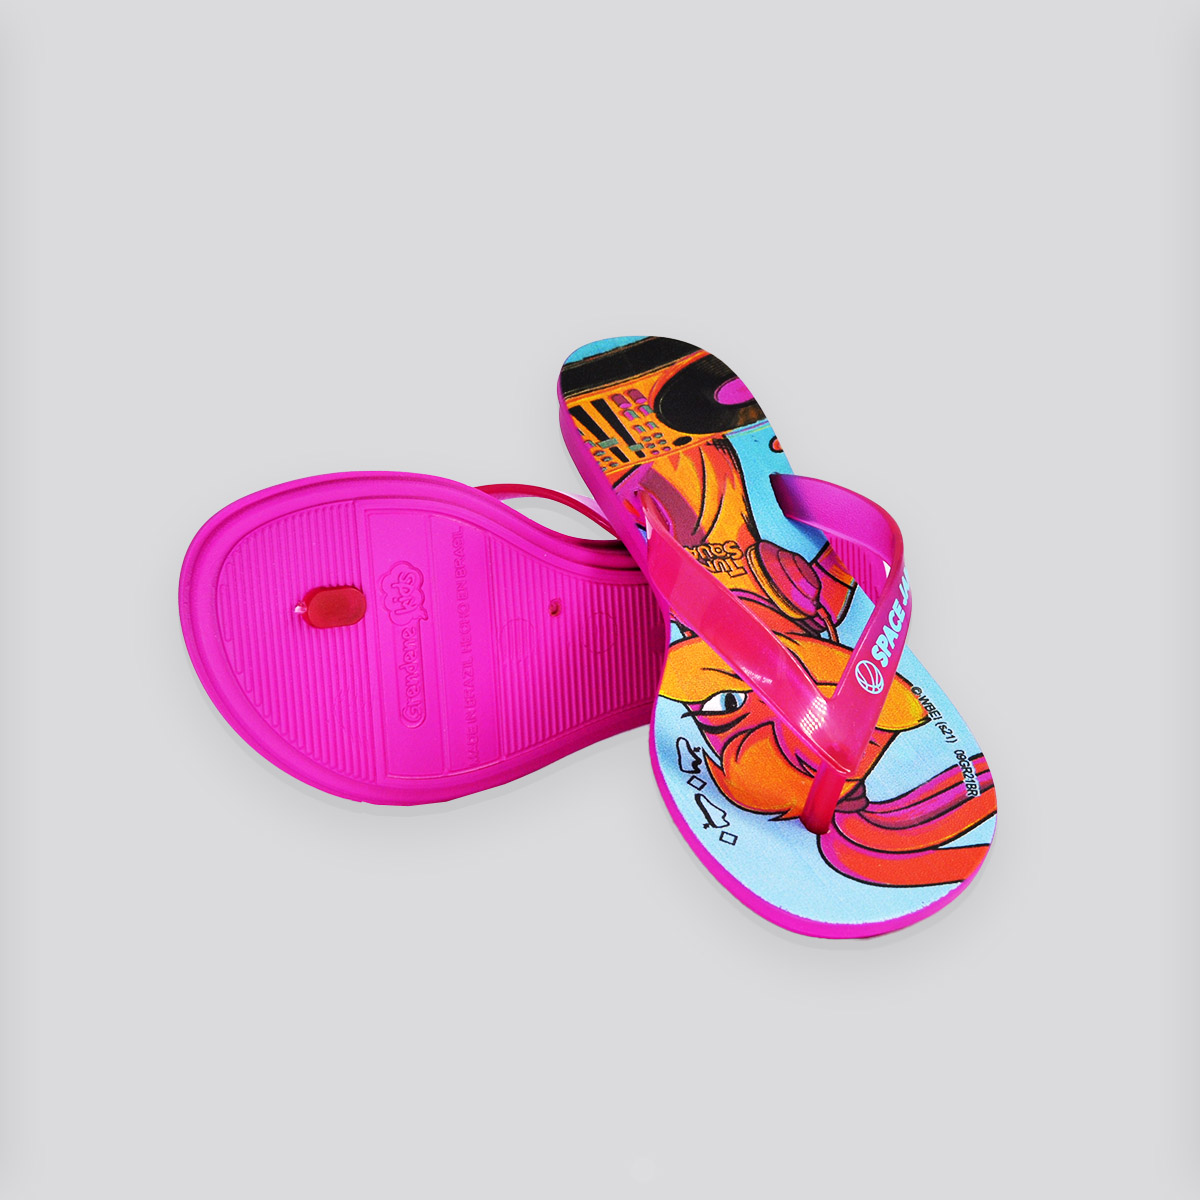 Chinelo Infantil Grendene Space Jam II Pop Rosa/Azul/Amarelo